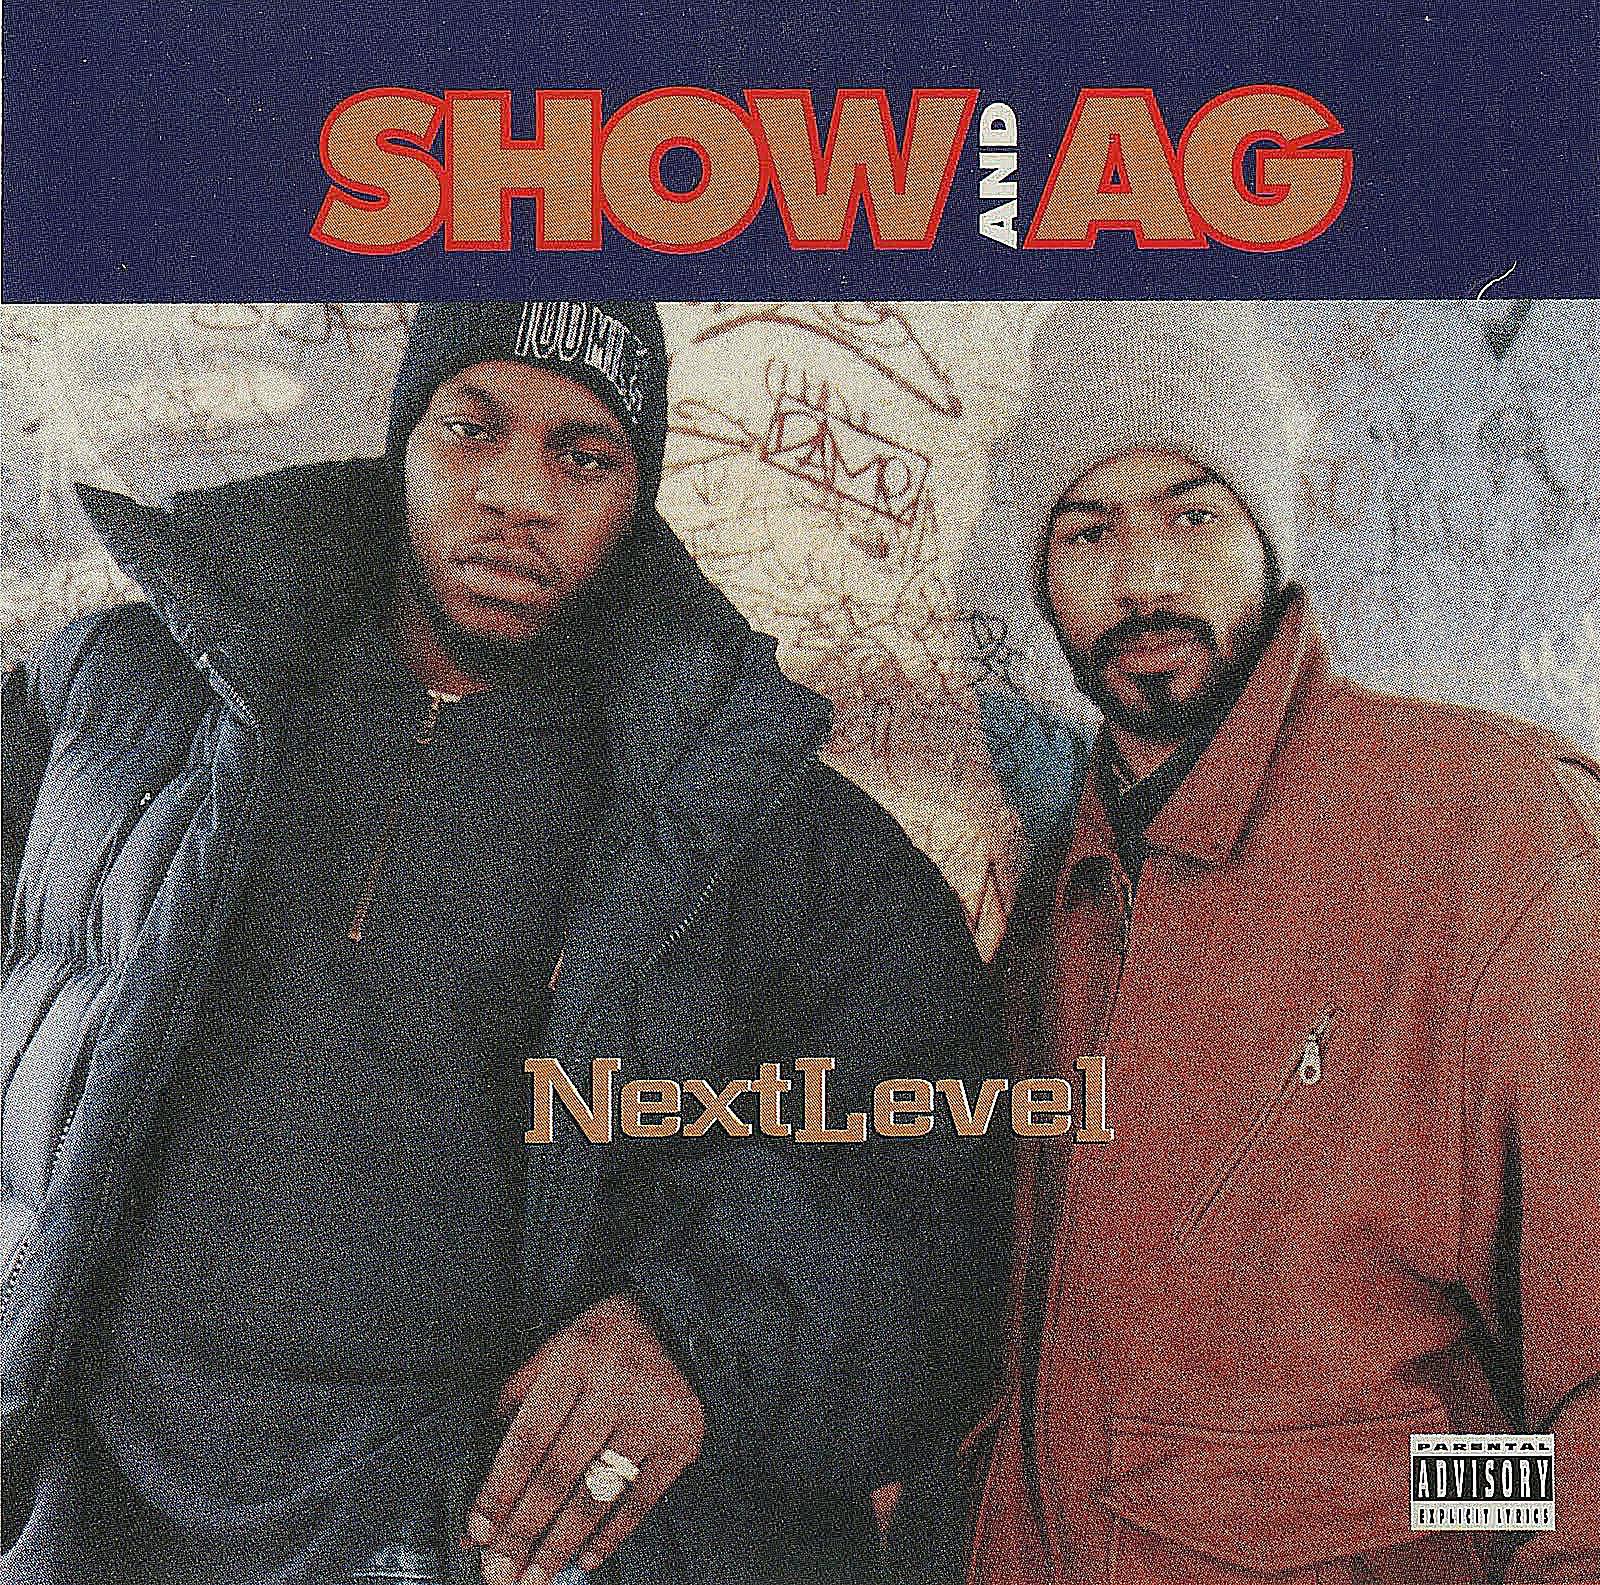 Show-A.G.-Next-Level cover art